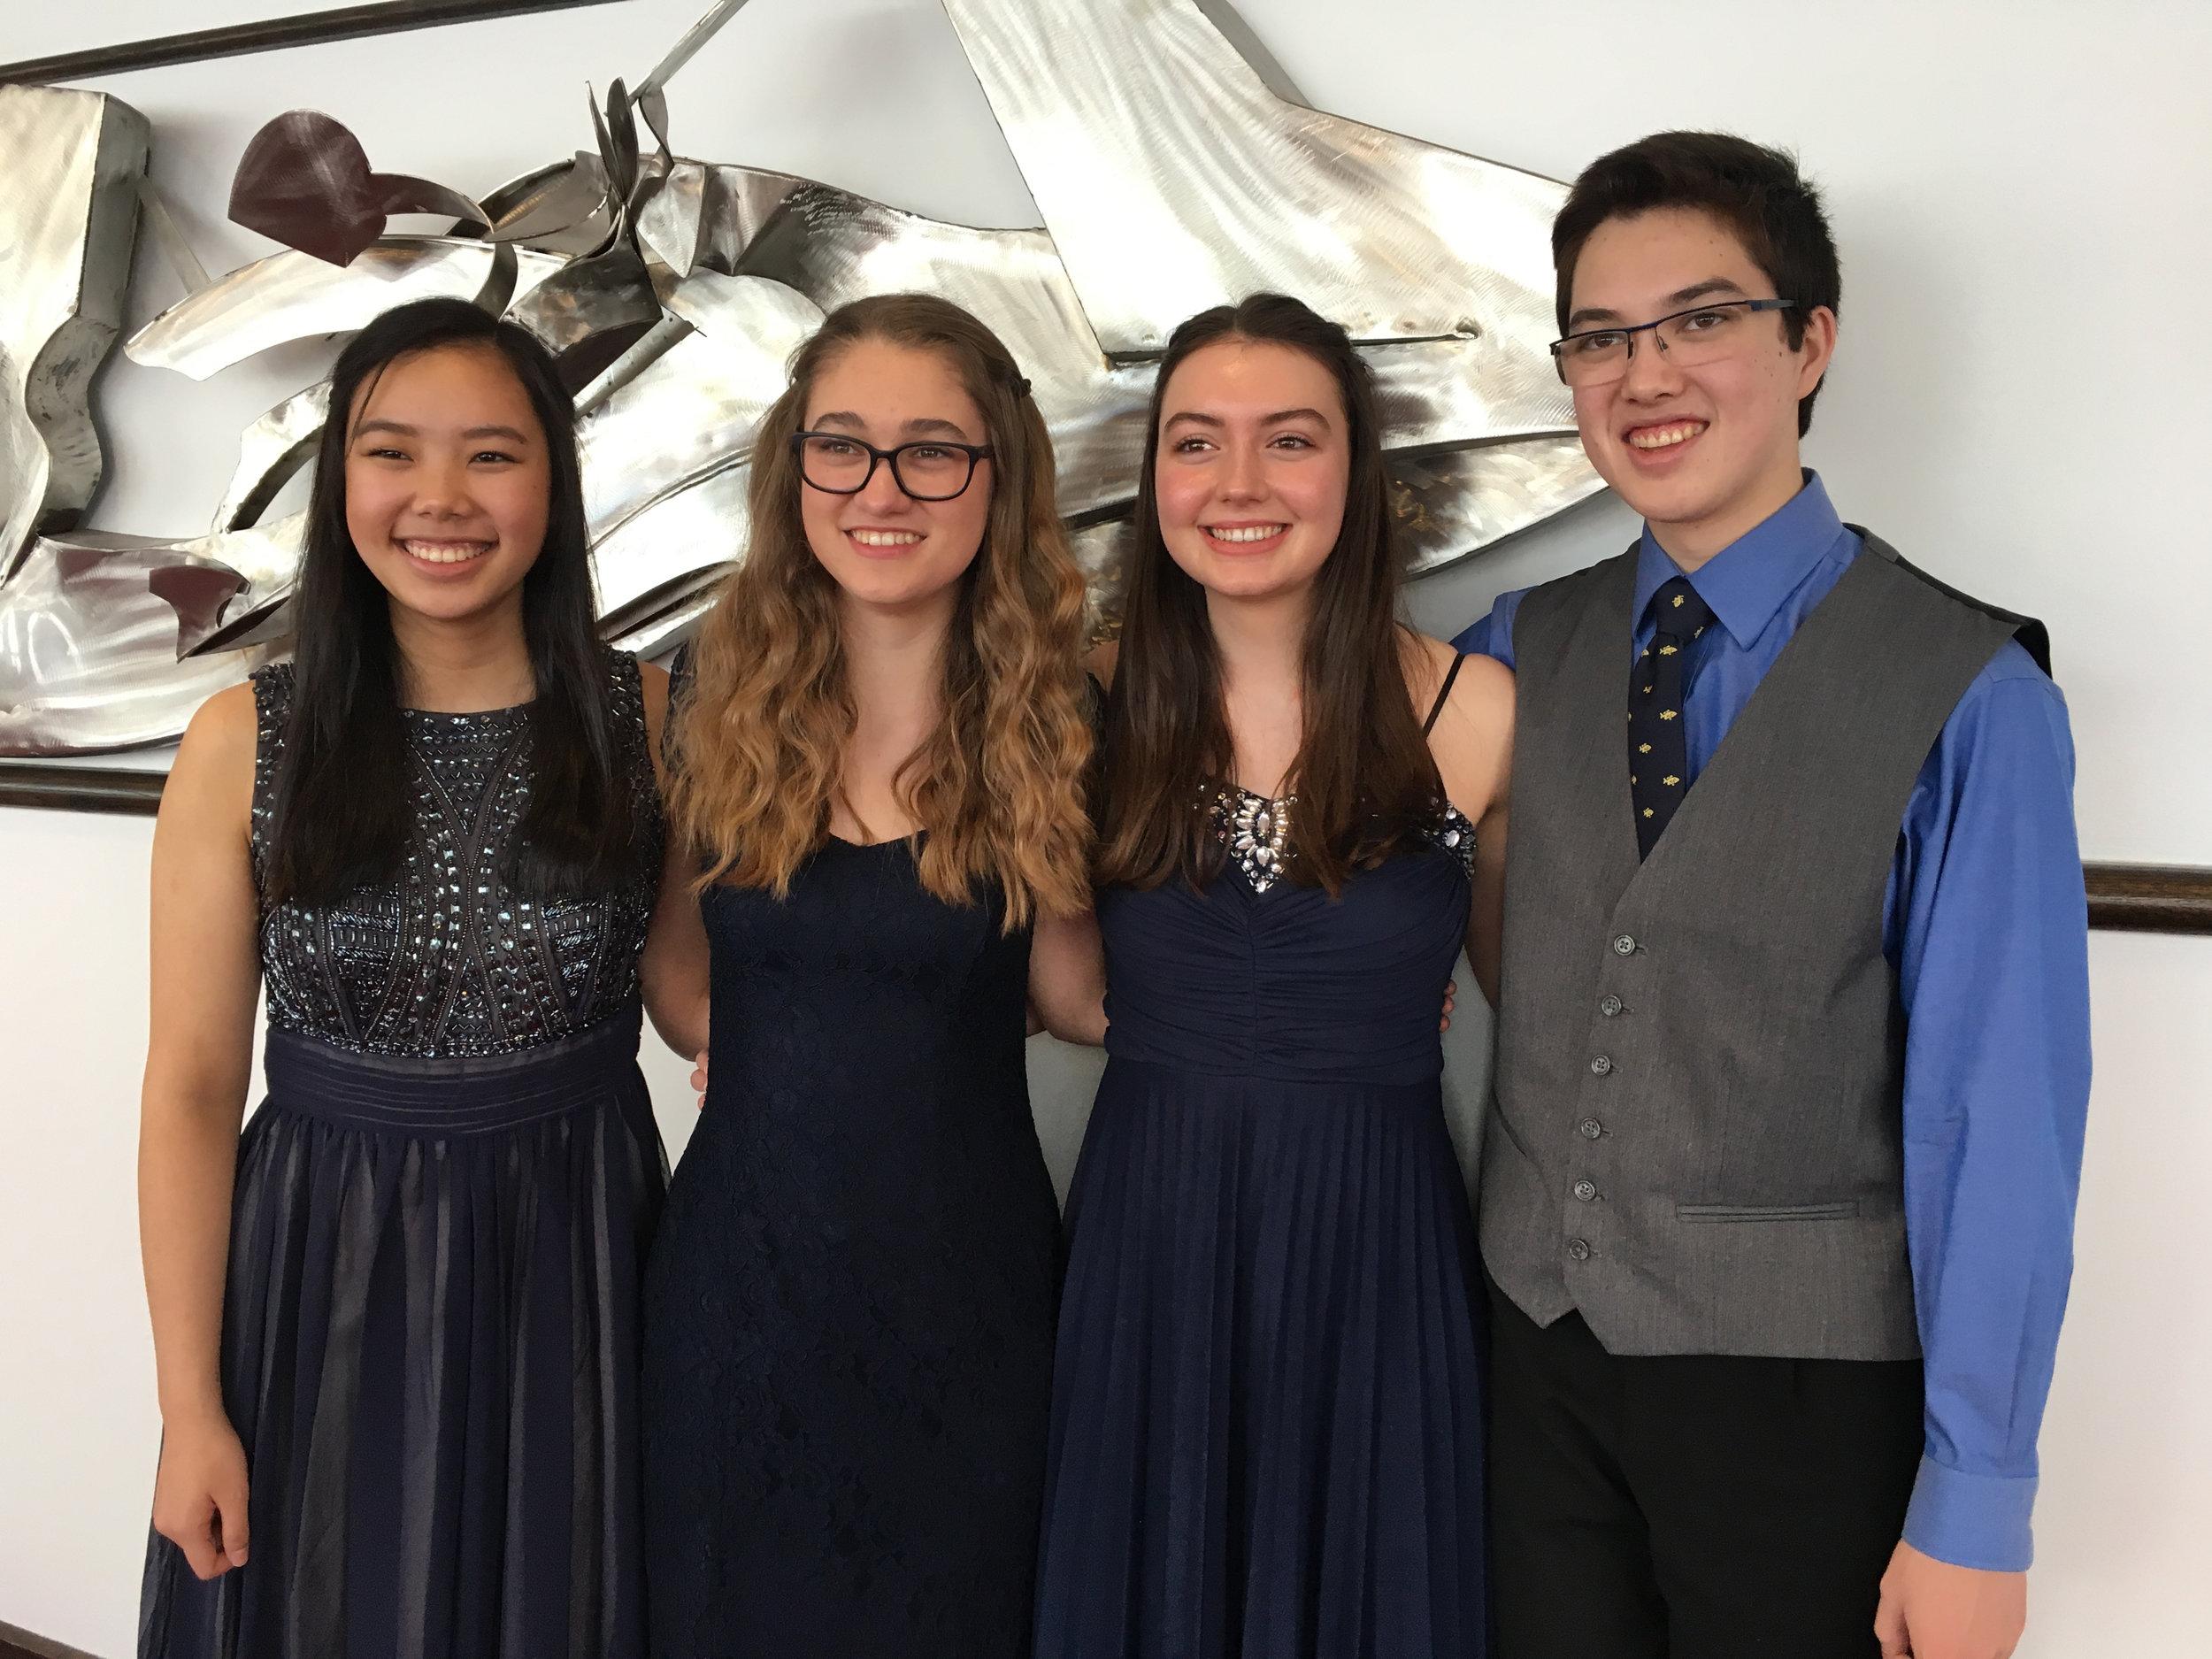 Quartet Fourzando (2018) —Joelle Chen, Makaela Foerderer, Elizabeth Bergmann, Dylan Kinneavy, coached by Tom Rosenberg